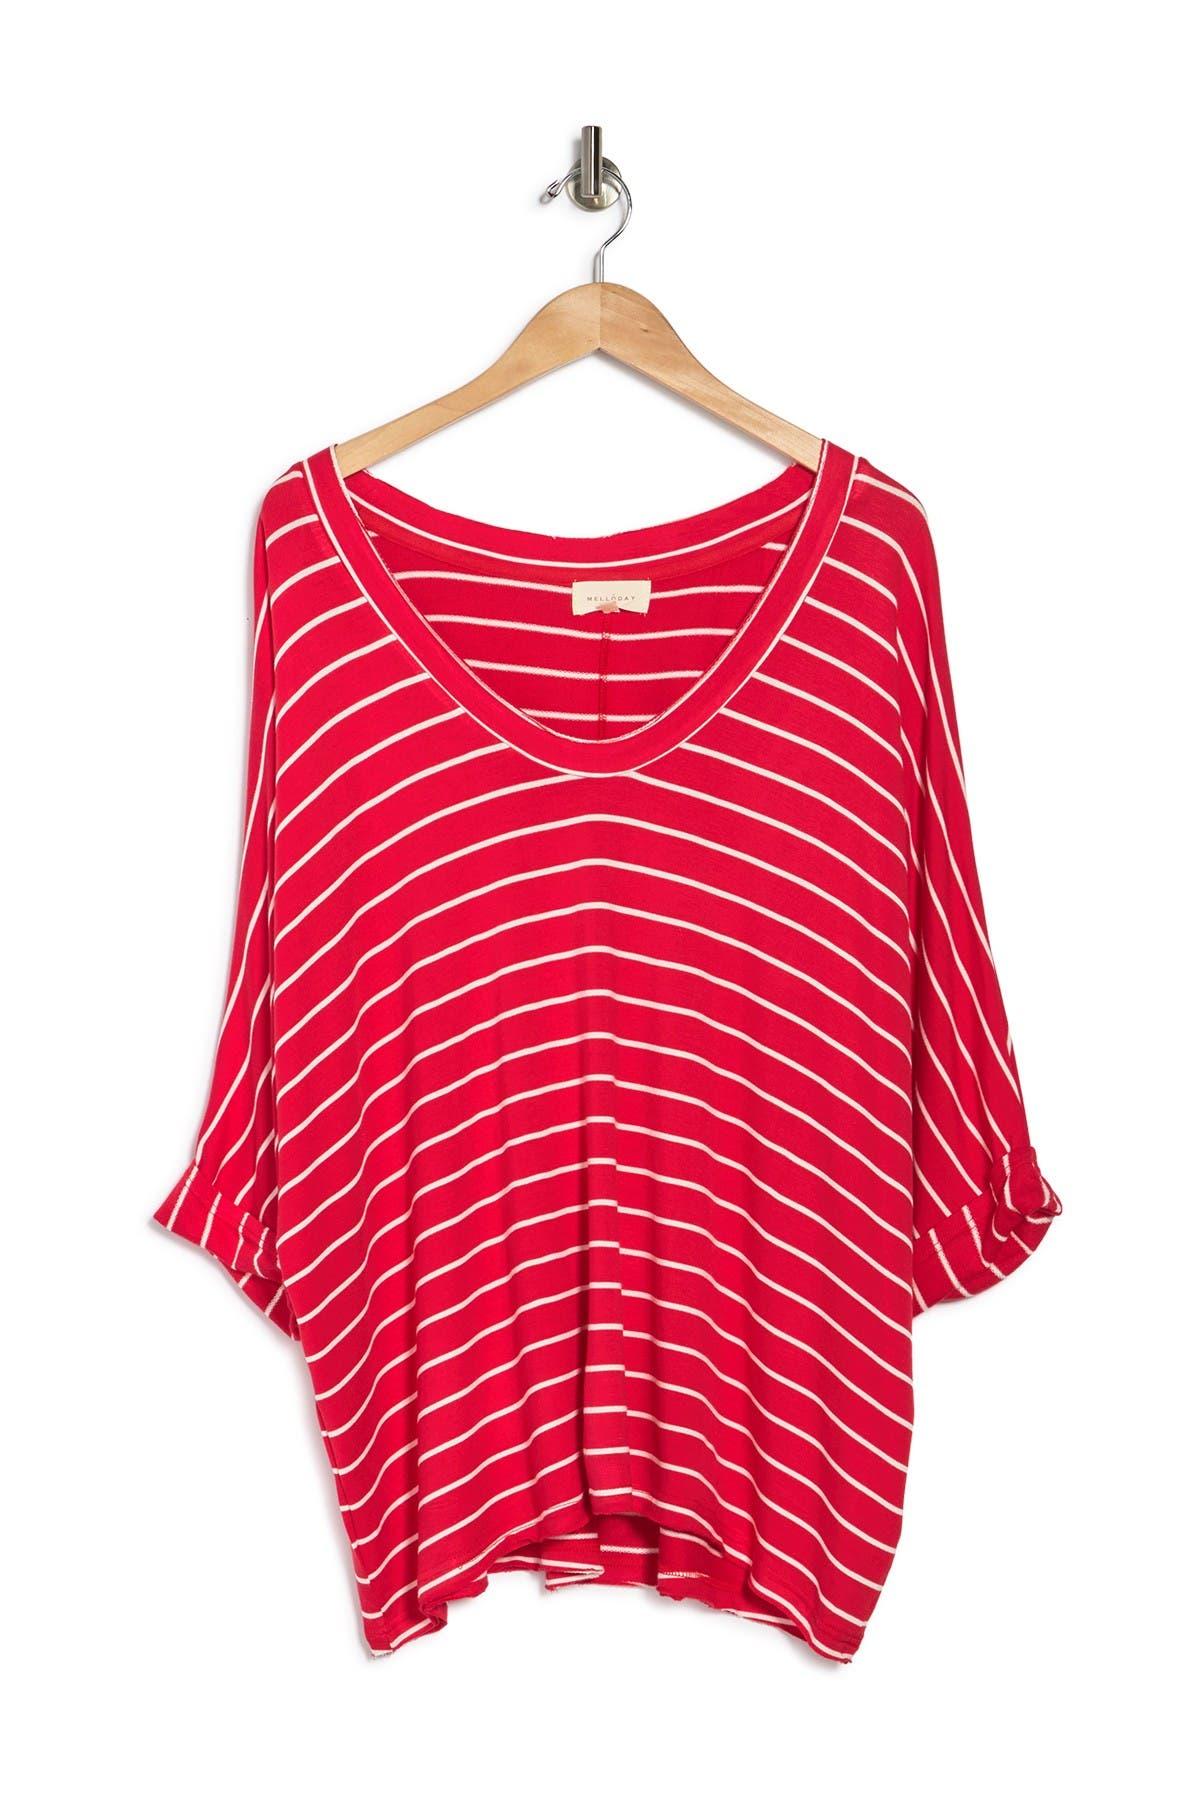 Melloday Dolman Roll Sleeve Stripe Top In Red/ivory Stripe